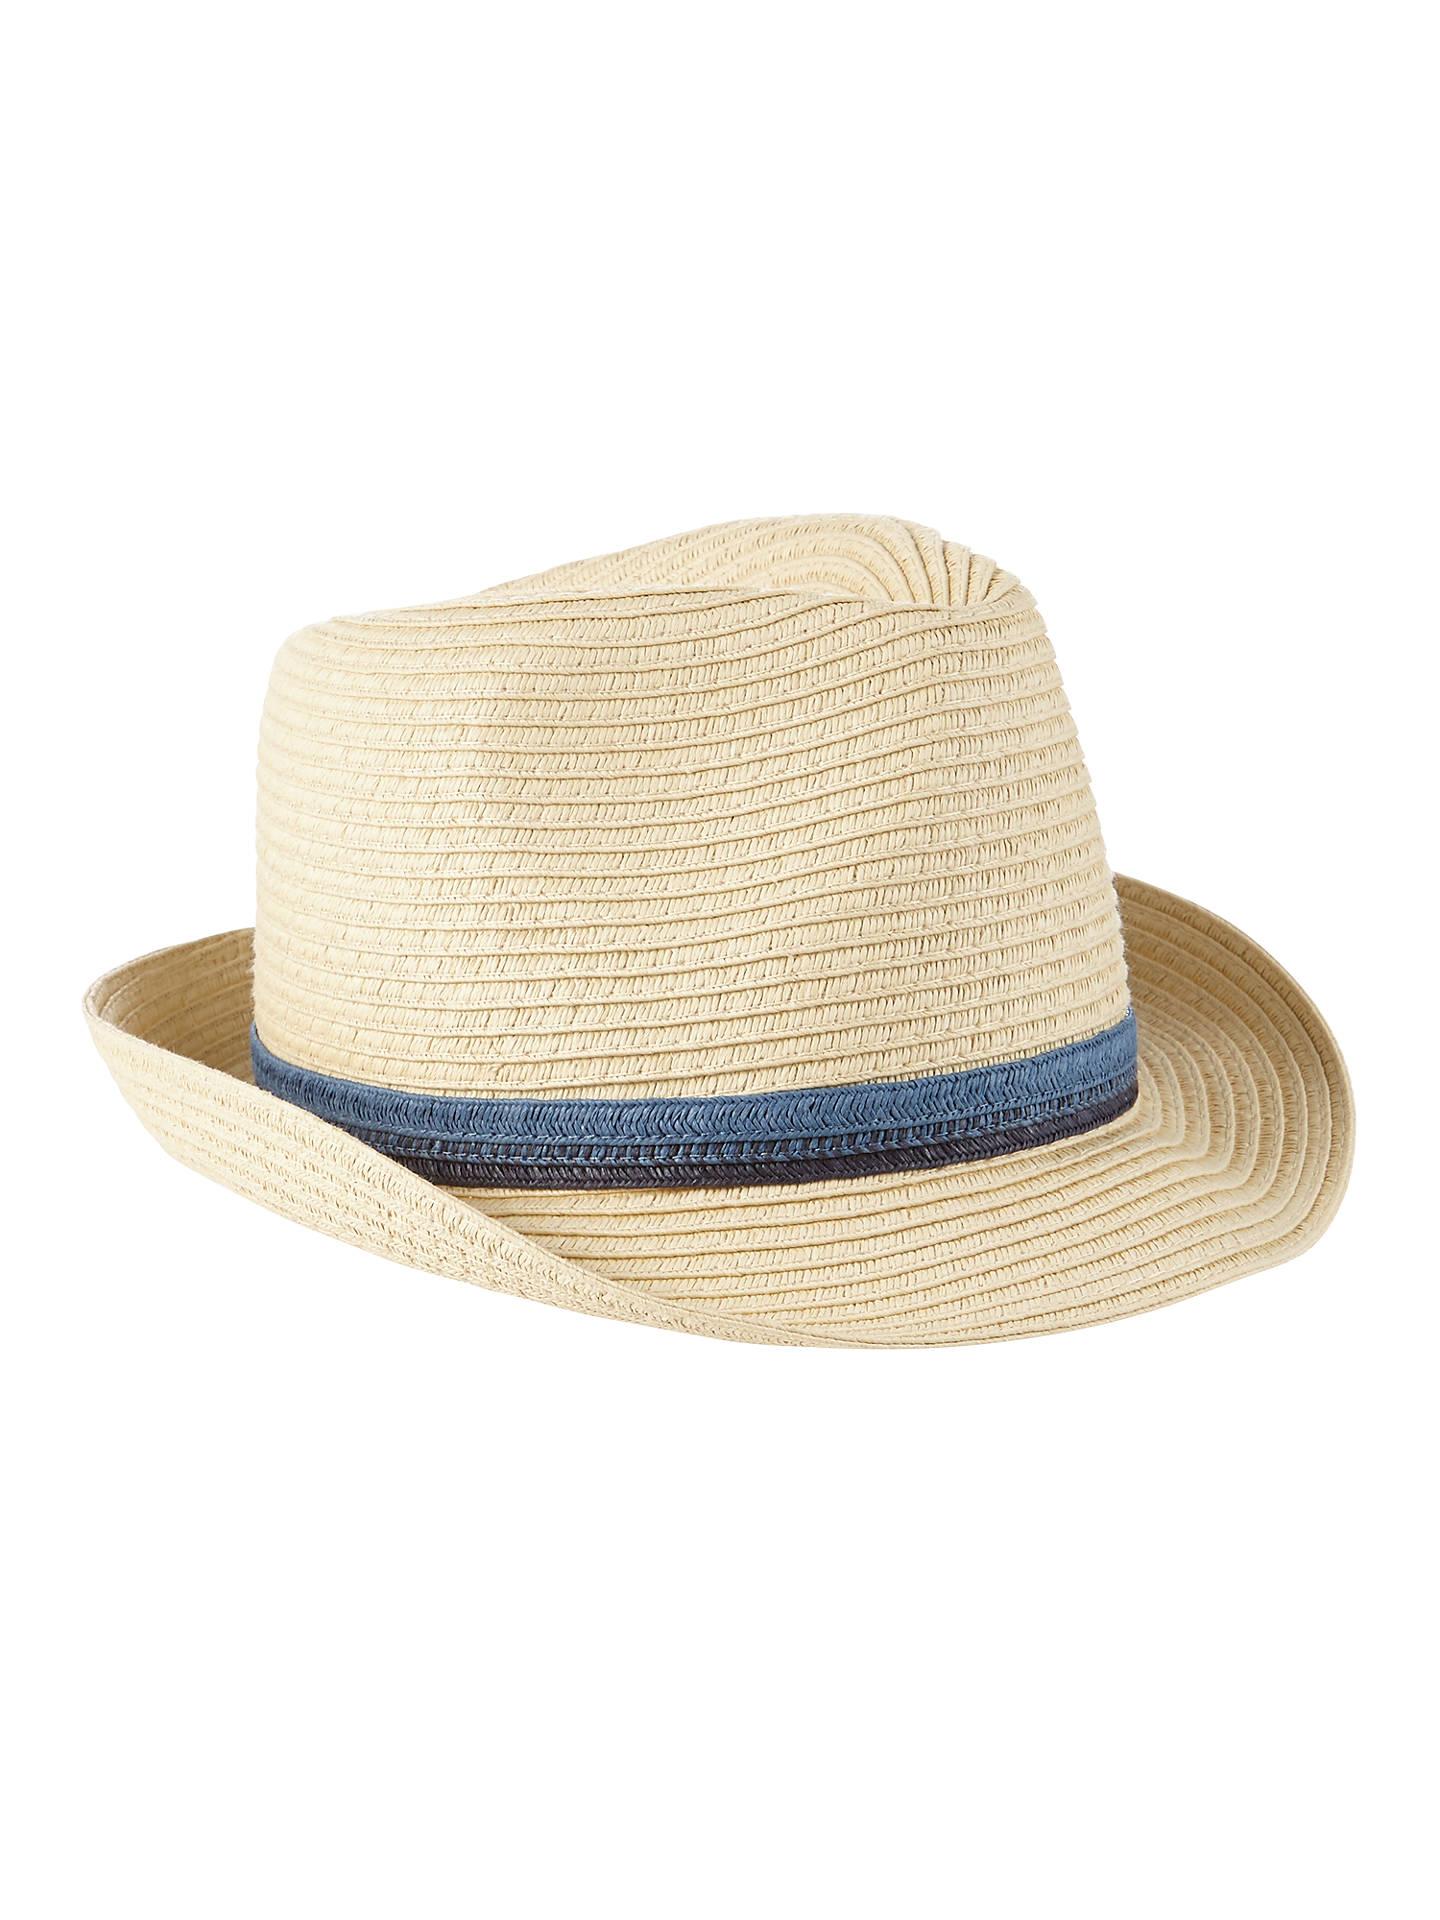 5ac2a6cc718c4 Buy John Lewis Children s Straw Trilby Hat